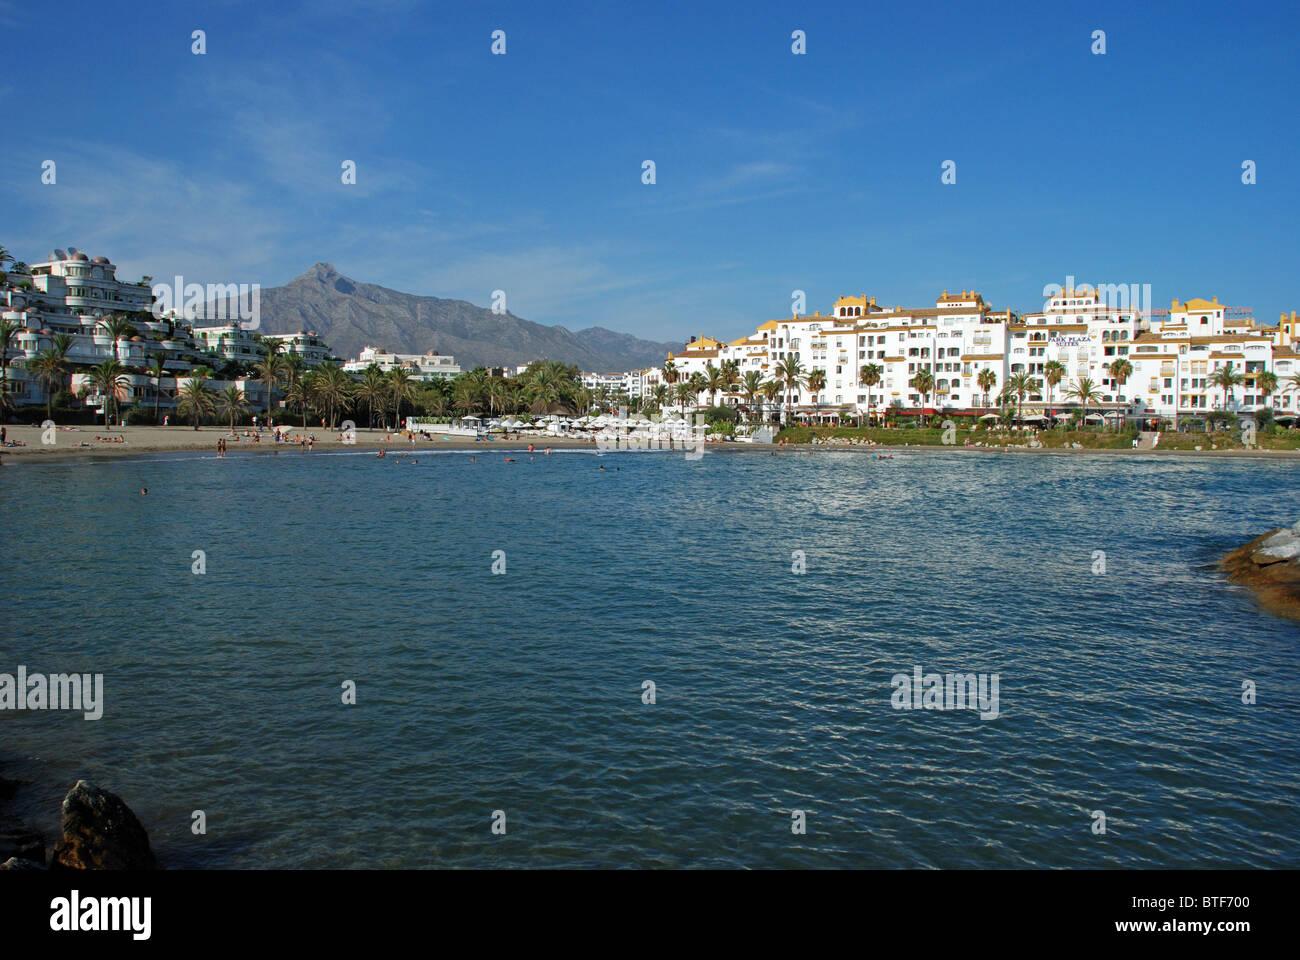 Puerto banus beach marbella stock photos puerto banus for Puerto banus costa del sol